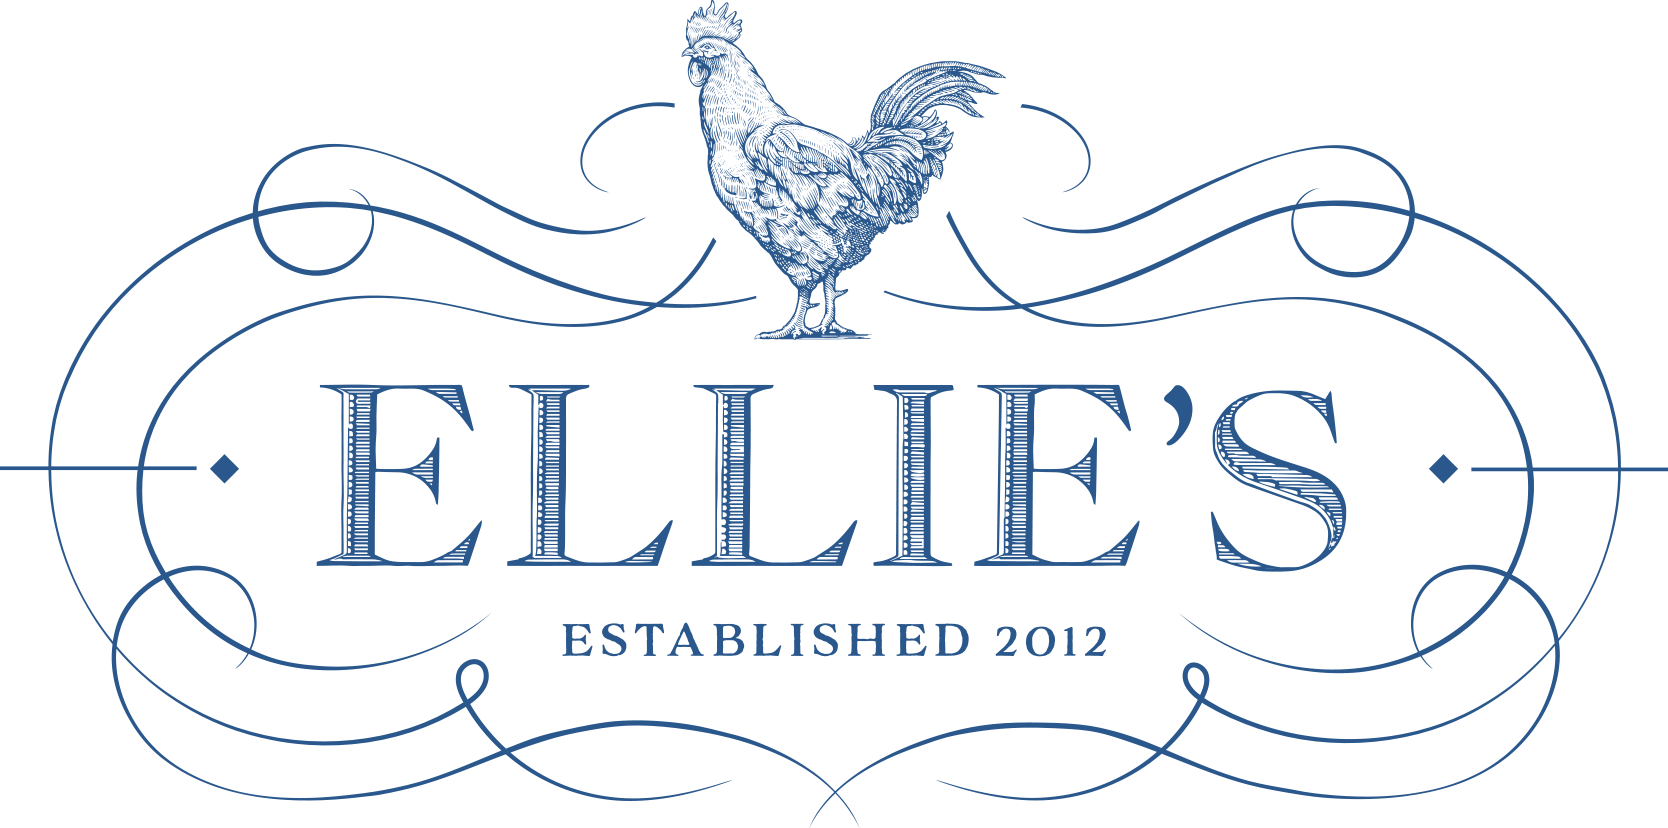 Serif font example: Ellie's Bakery logo